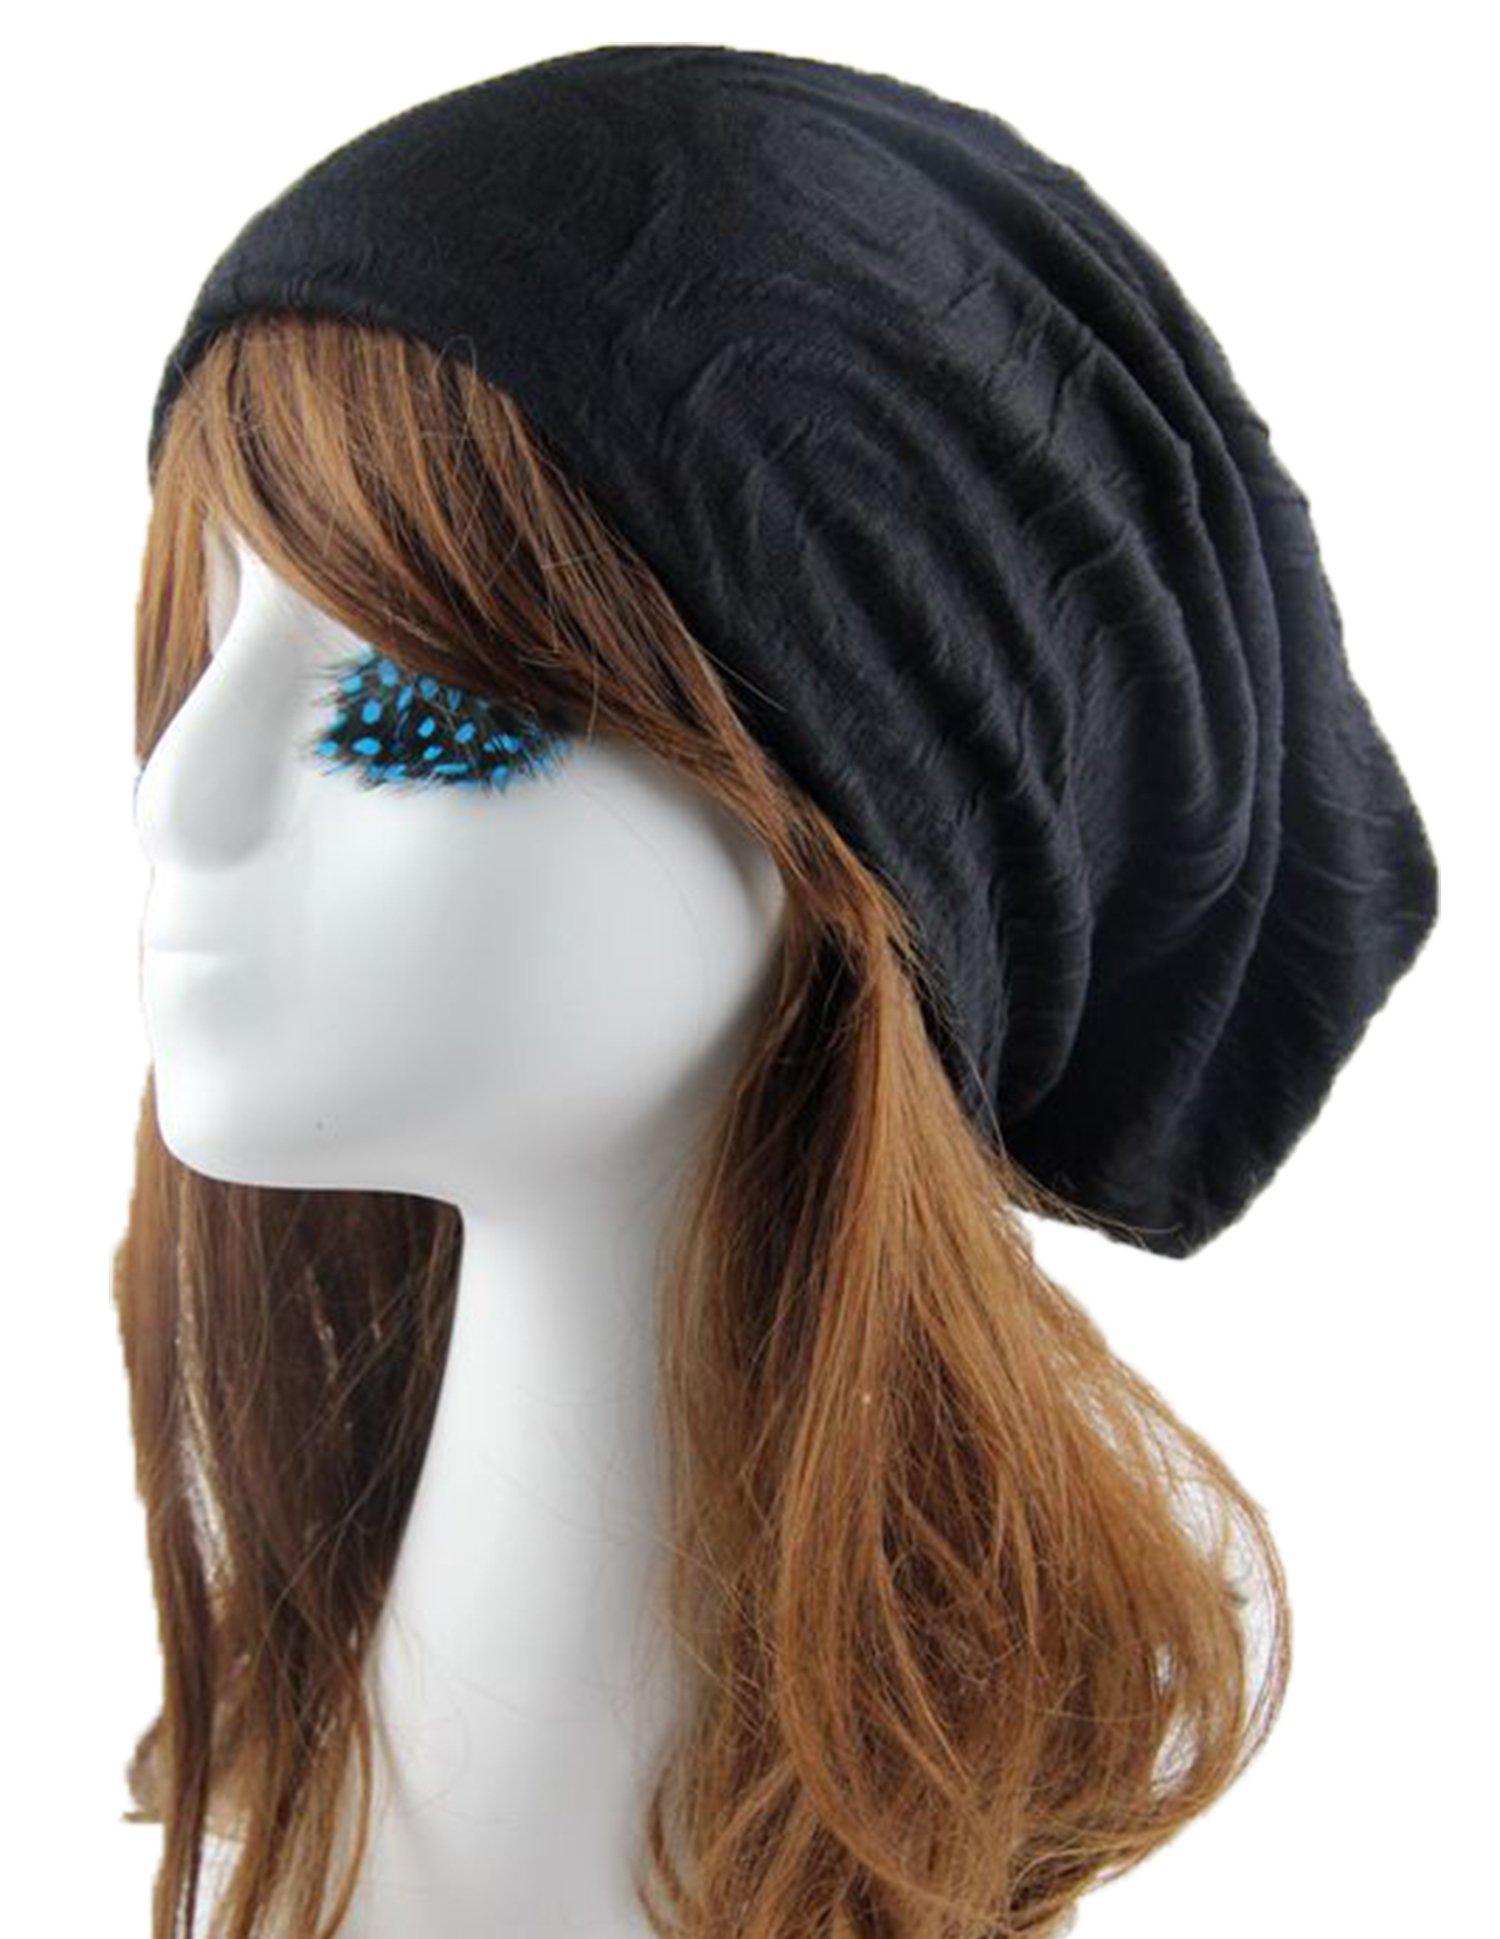 Urban Virgin Slap Beanie, Womens Soft Slouchy Cap Black One Size (30.526.5CM)